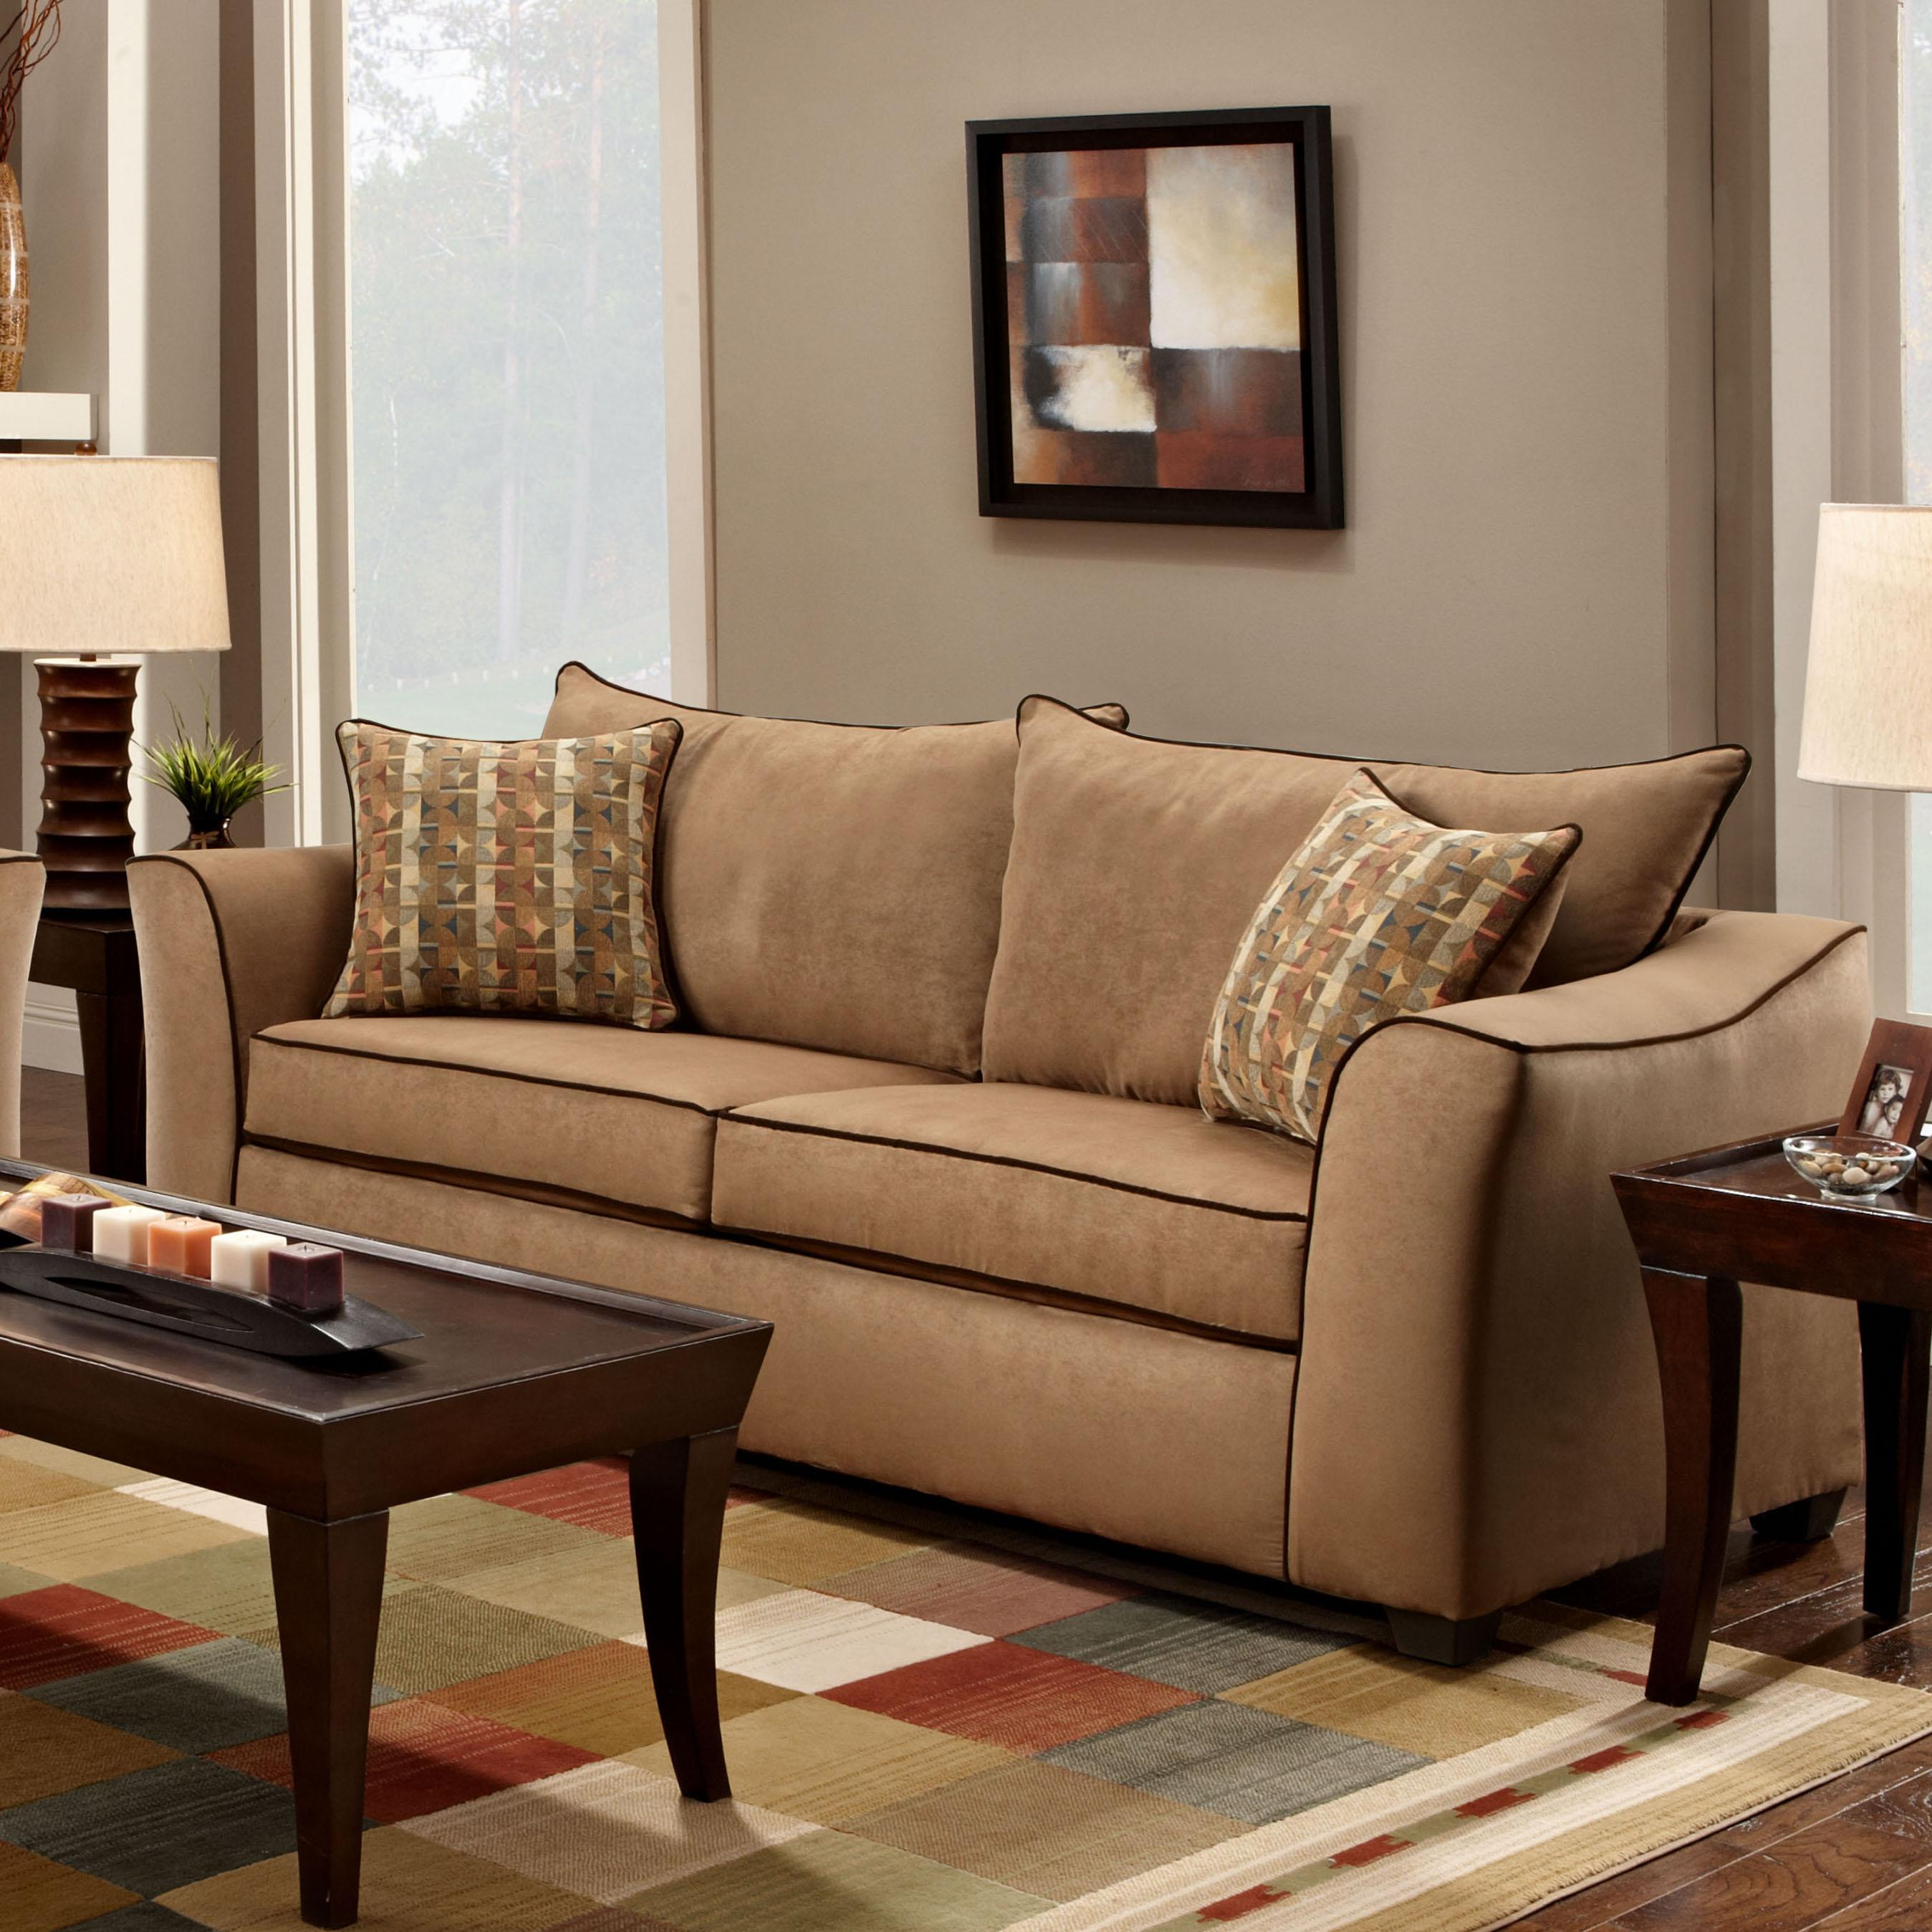 1160 Stationary Sofa by Washington Furniture at Lynn's Furniture & Mattress